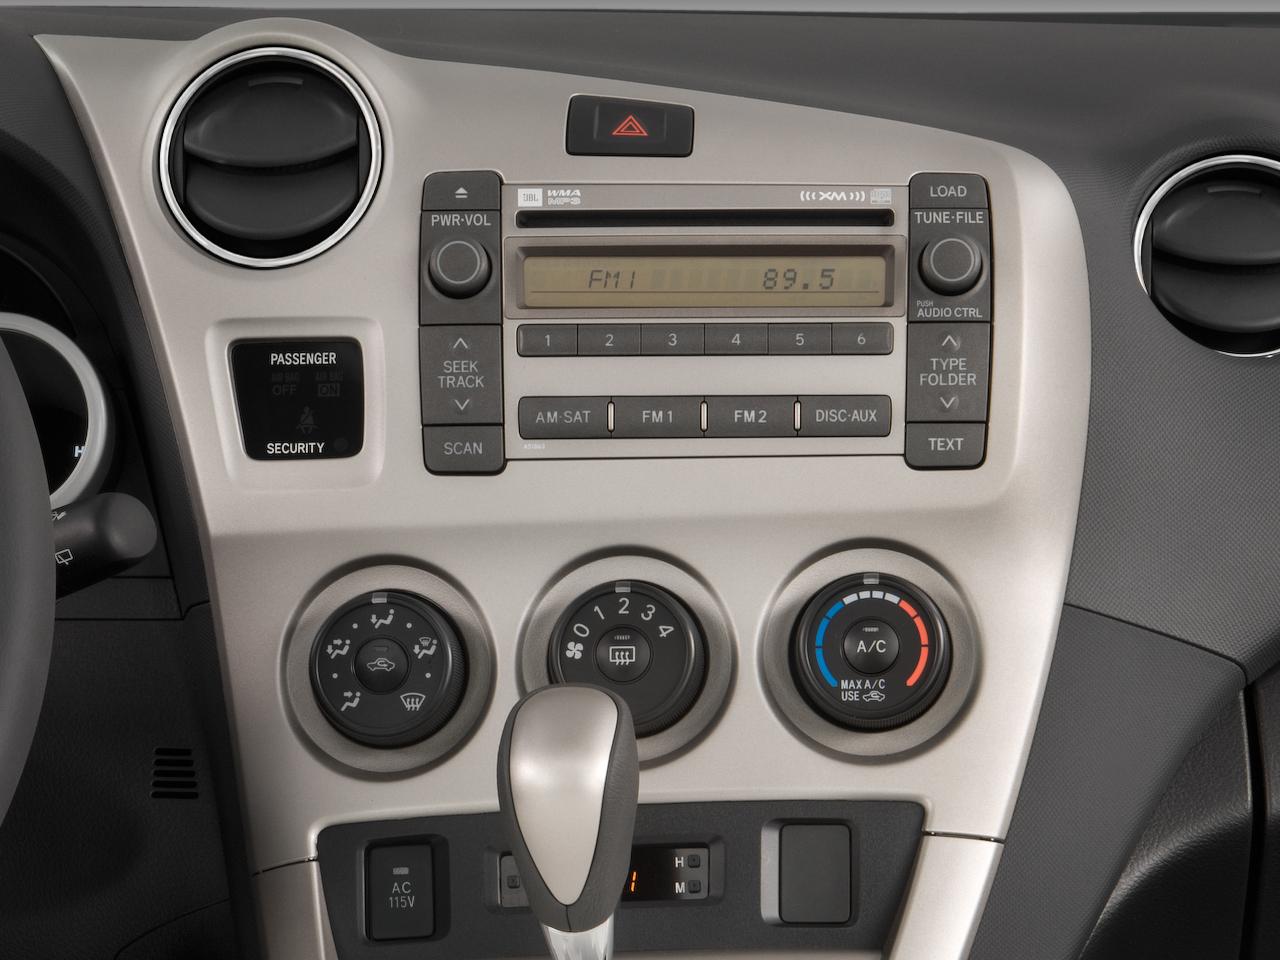 2009 Toyota Matrix XRS  Toyota Midsize Hatchback Review